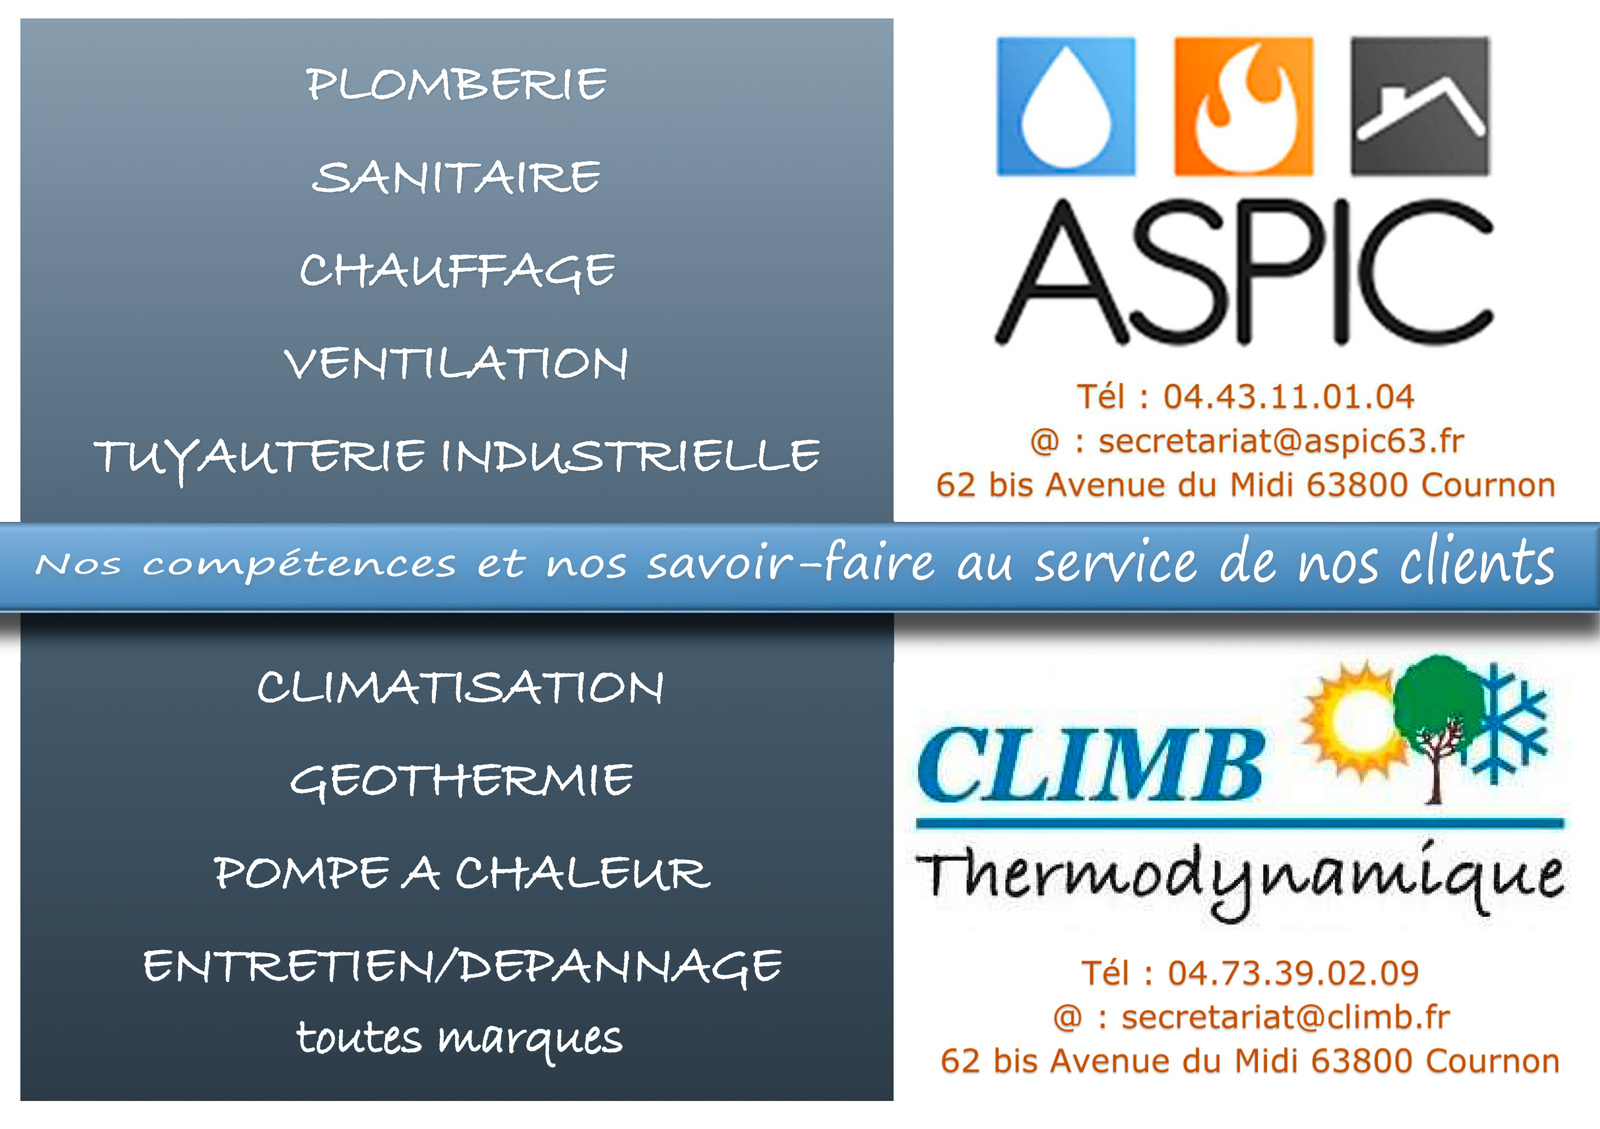 logo Aspic - Chauffage - Sanitaires